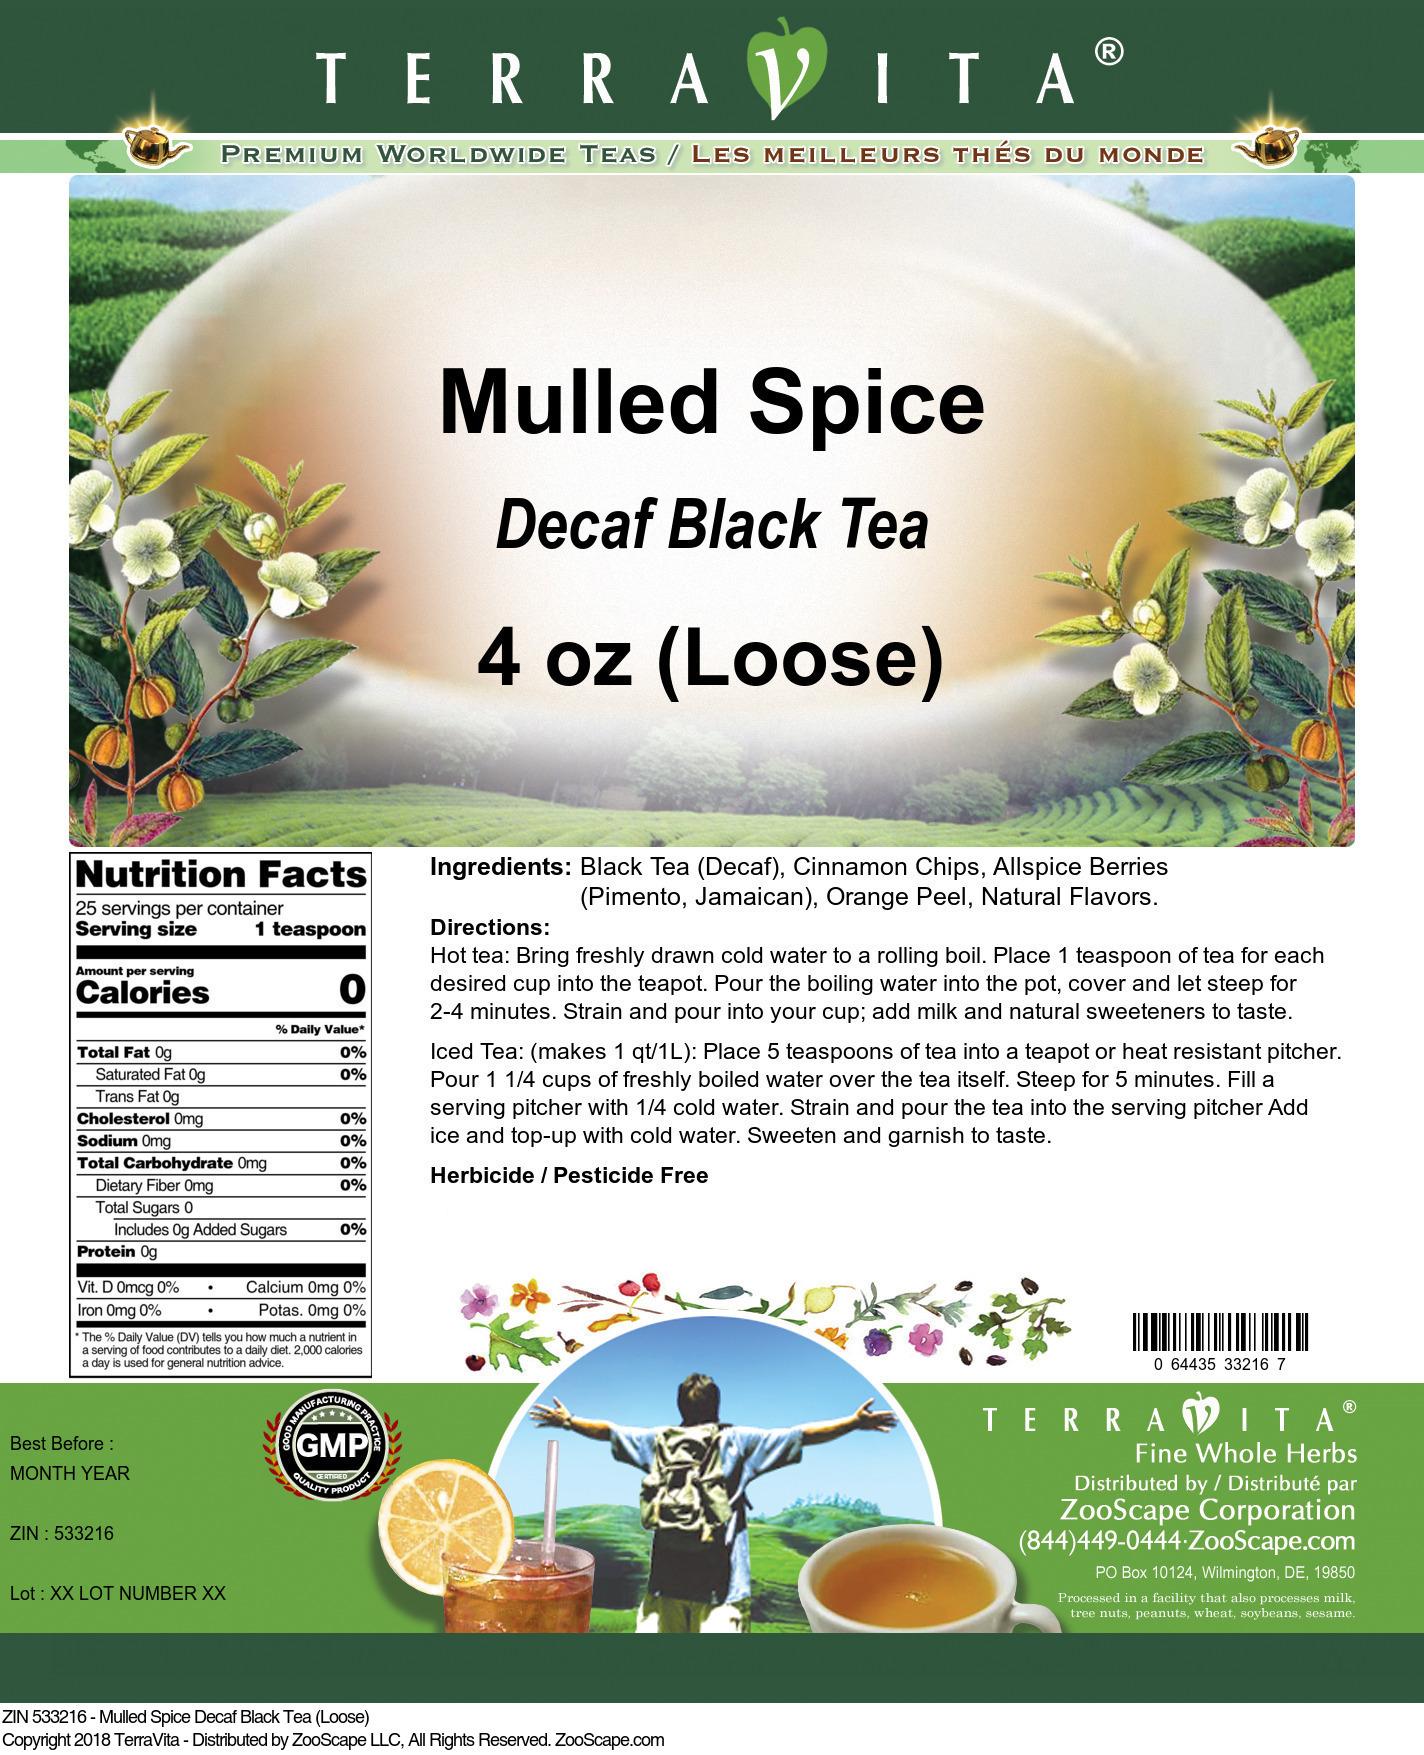 Mulled Spice Decaf Black Tea